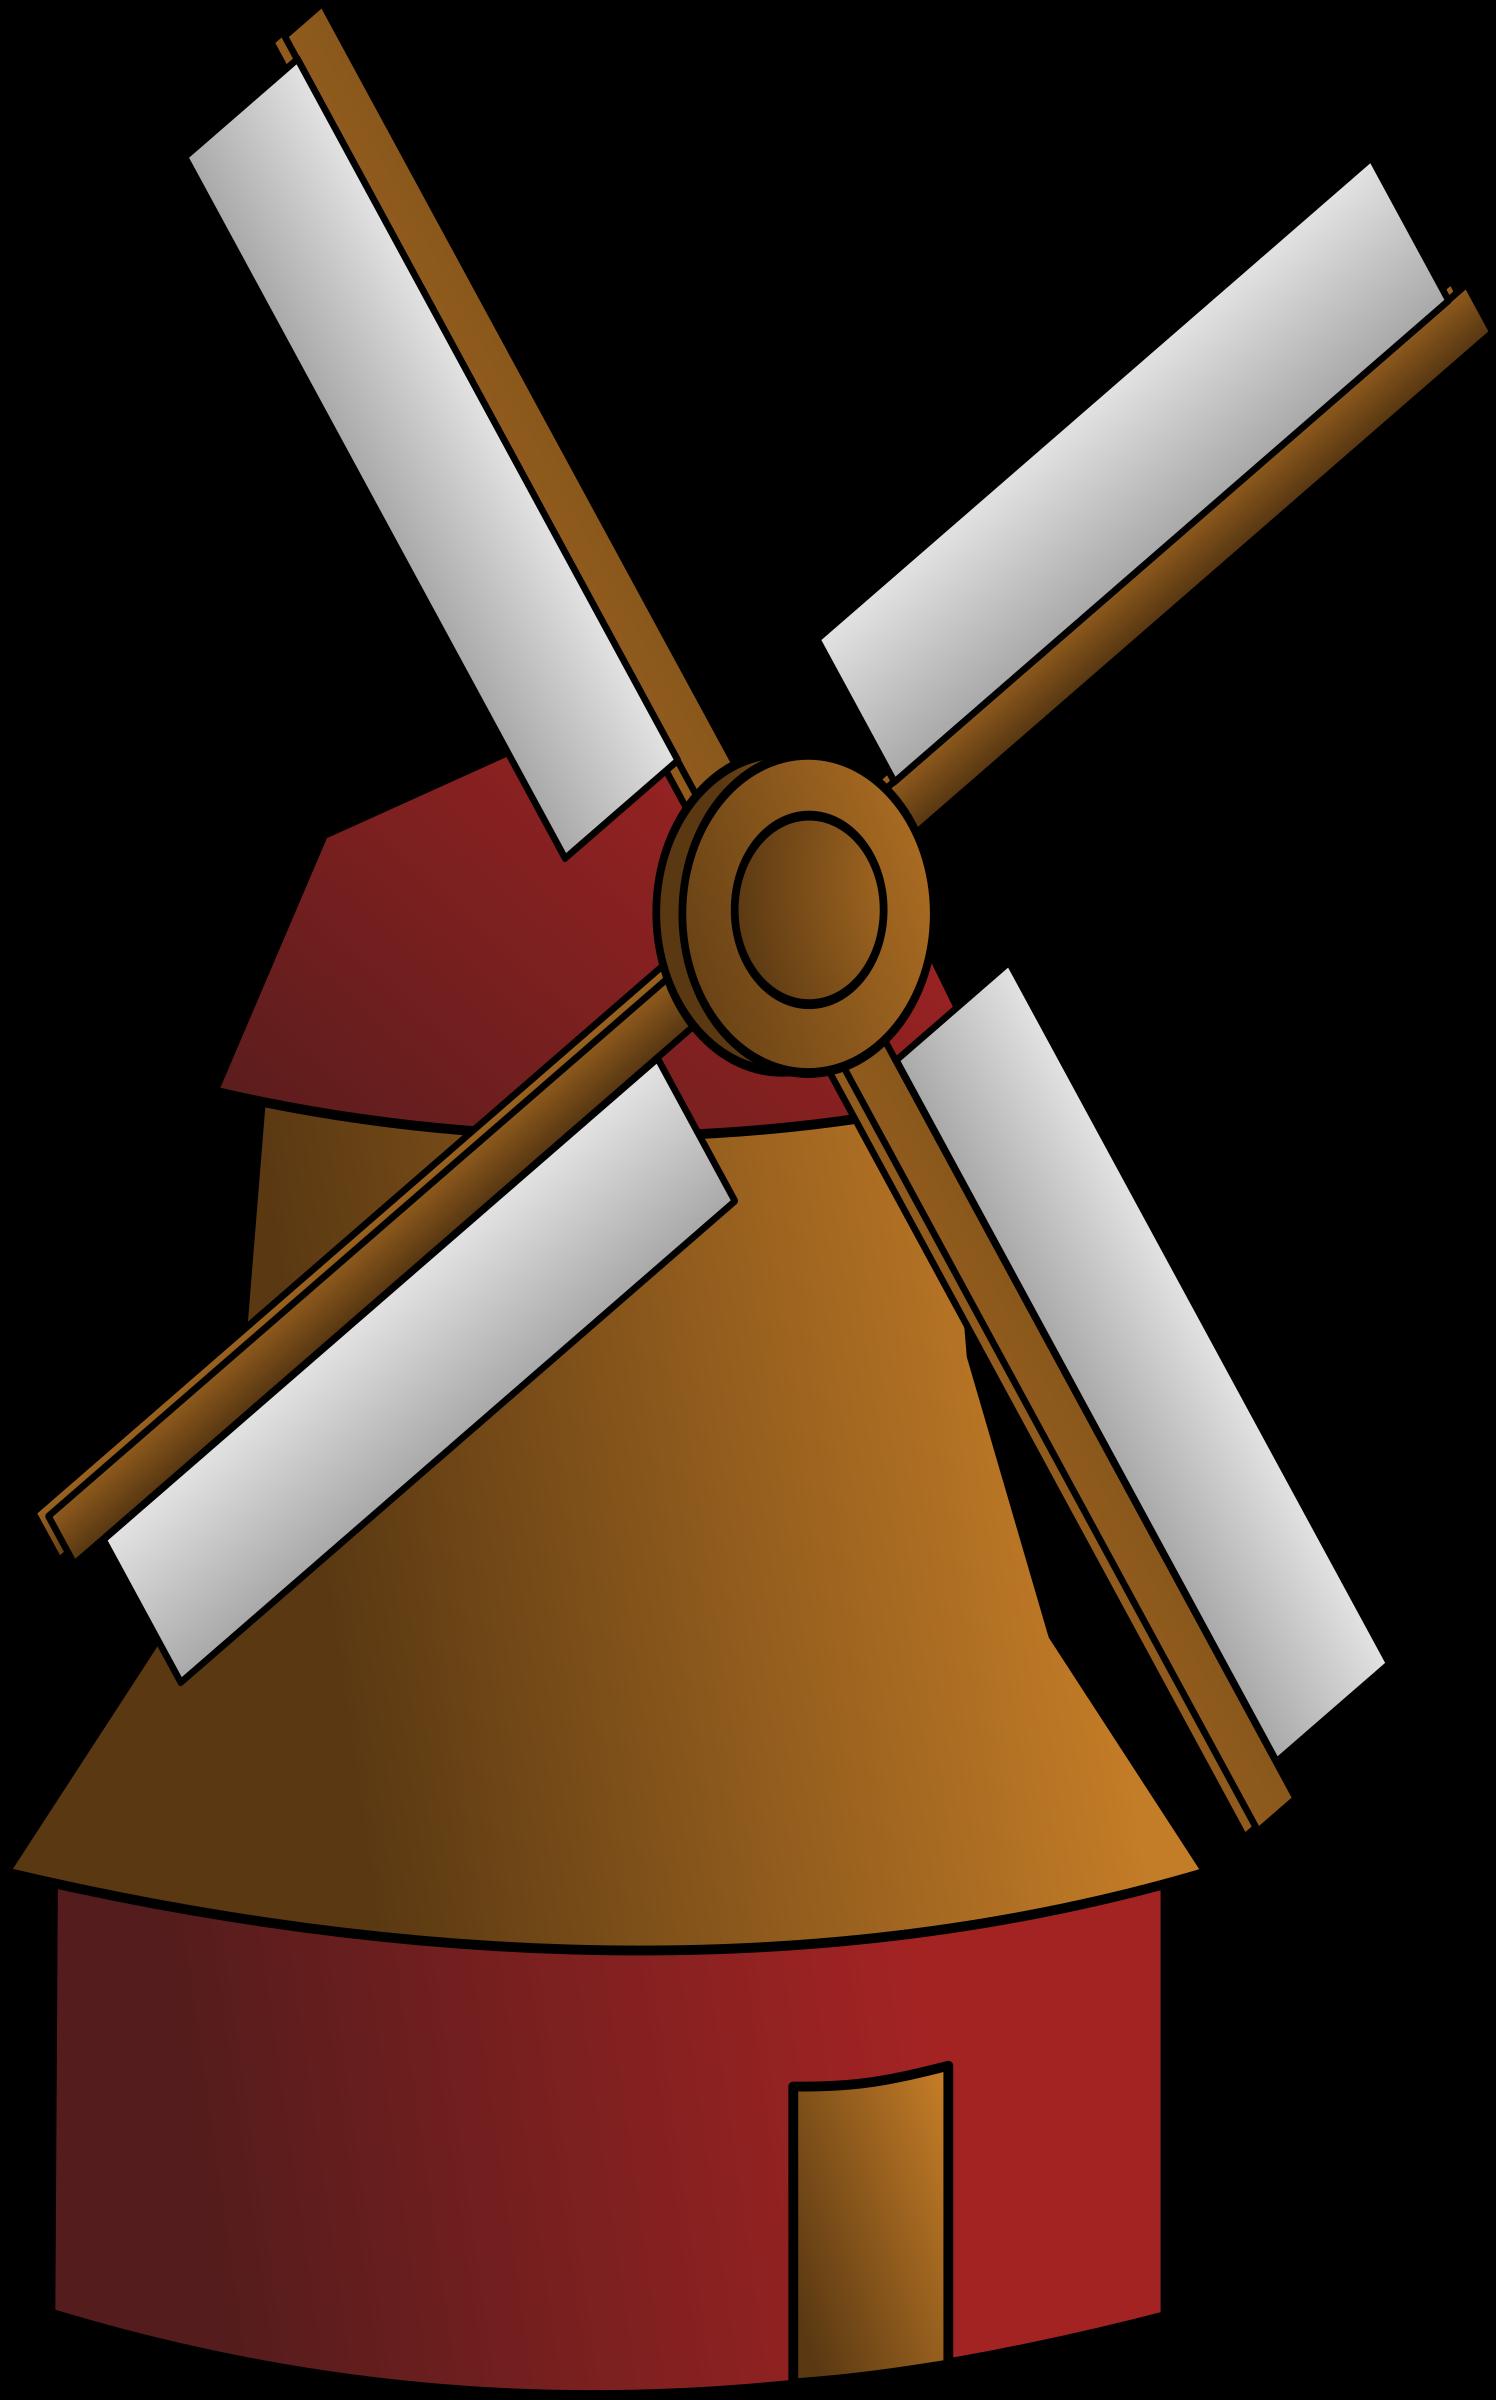 Windmill big image png. Flour clipart vector